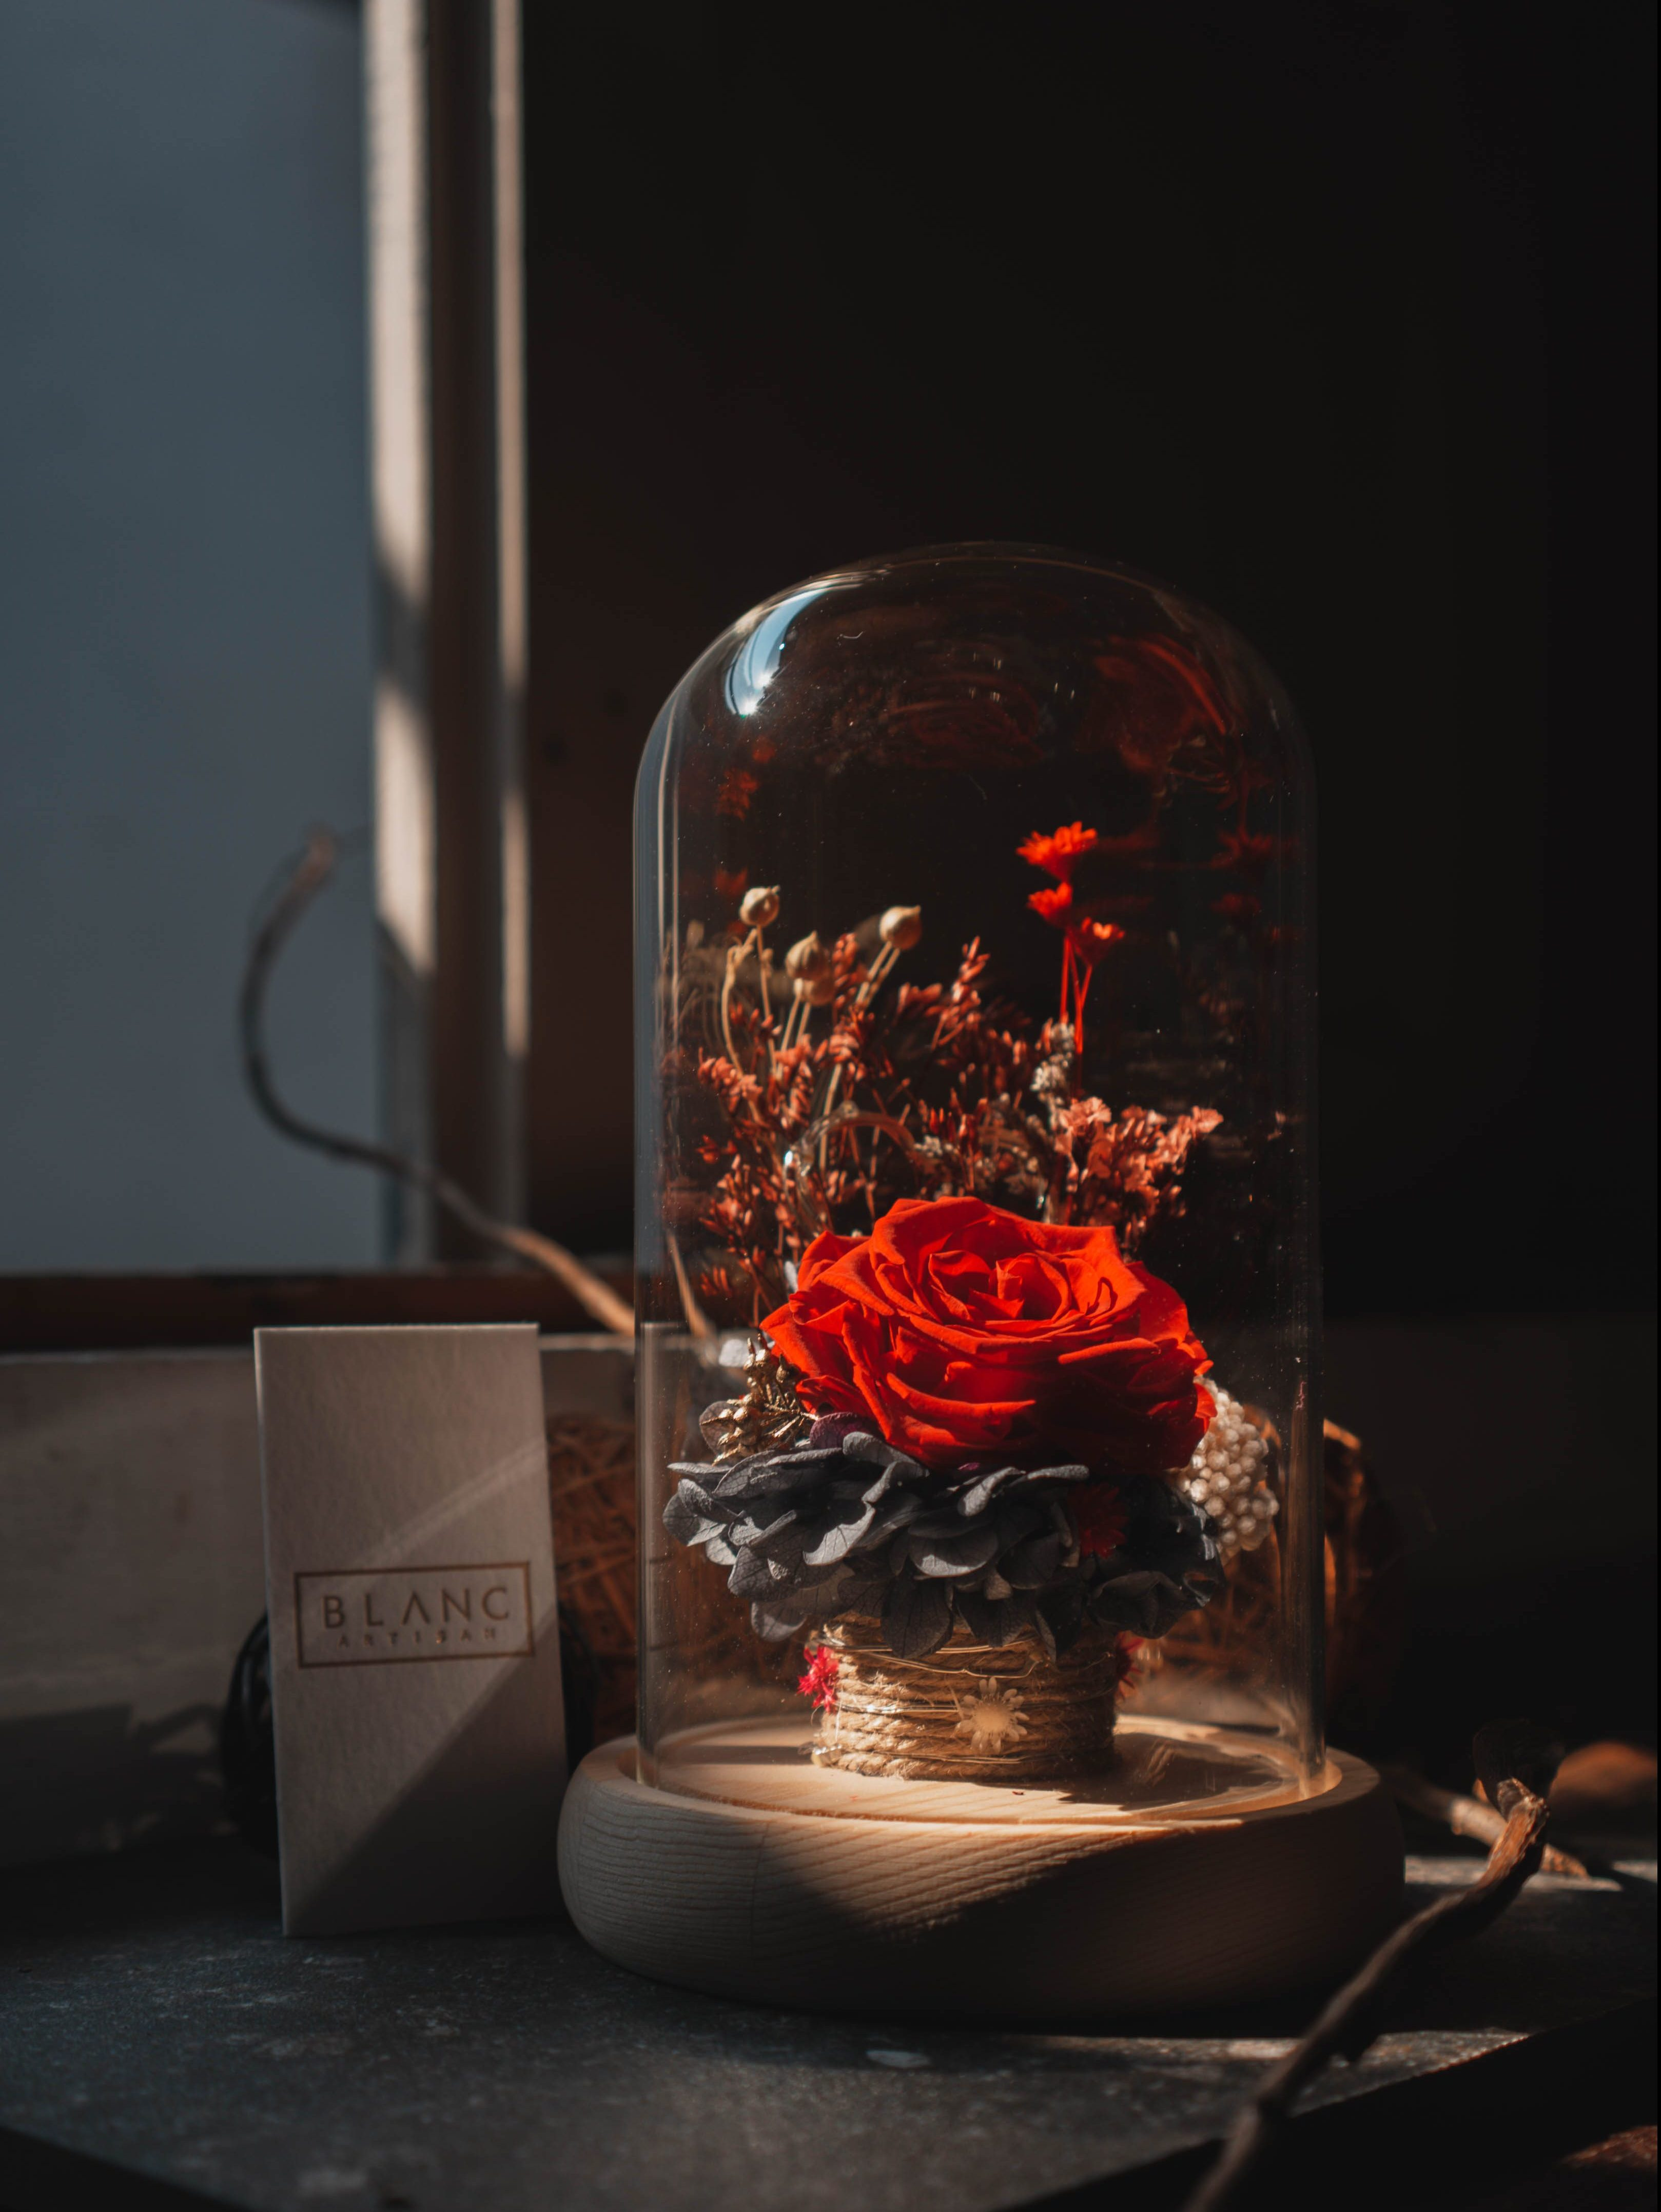 RENNES - PRESERVED RED ROSE DOME | LA VIE EN ROSE | BLANC SIGNATURE